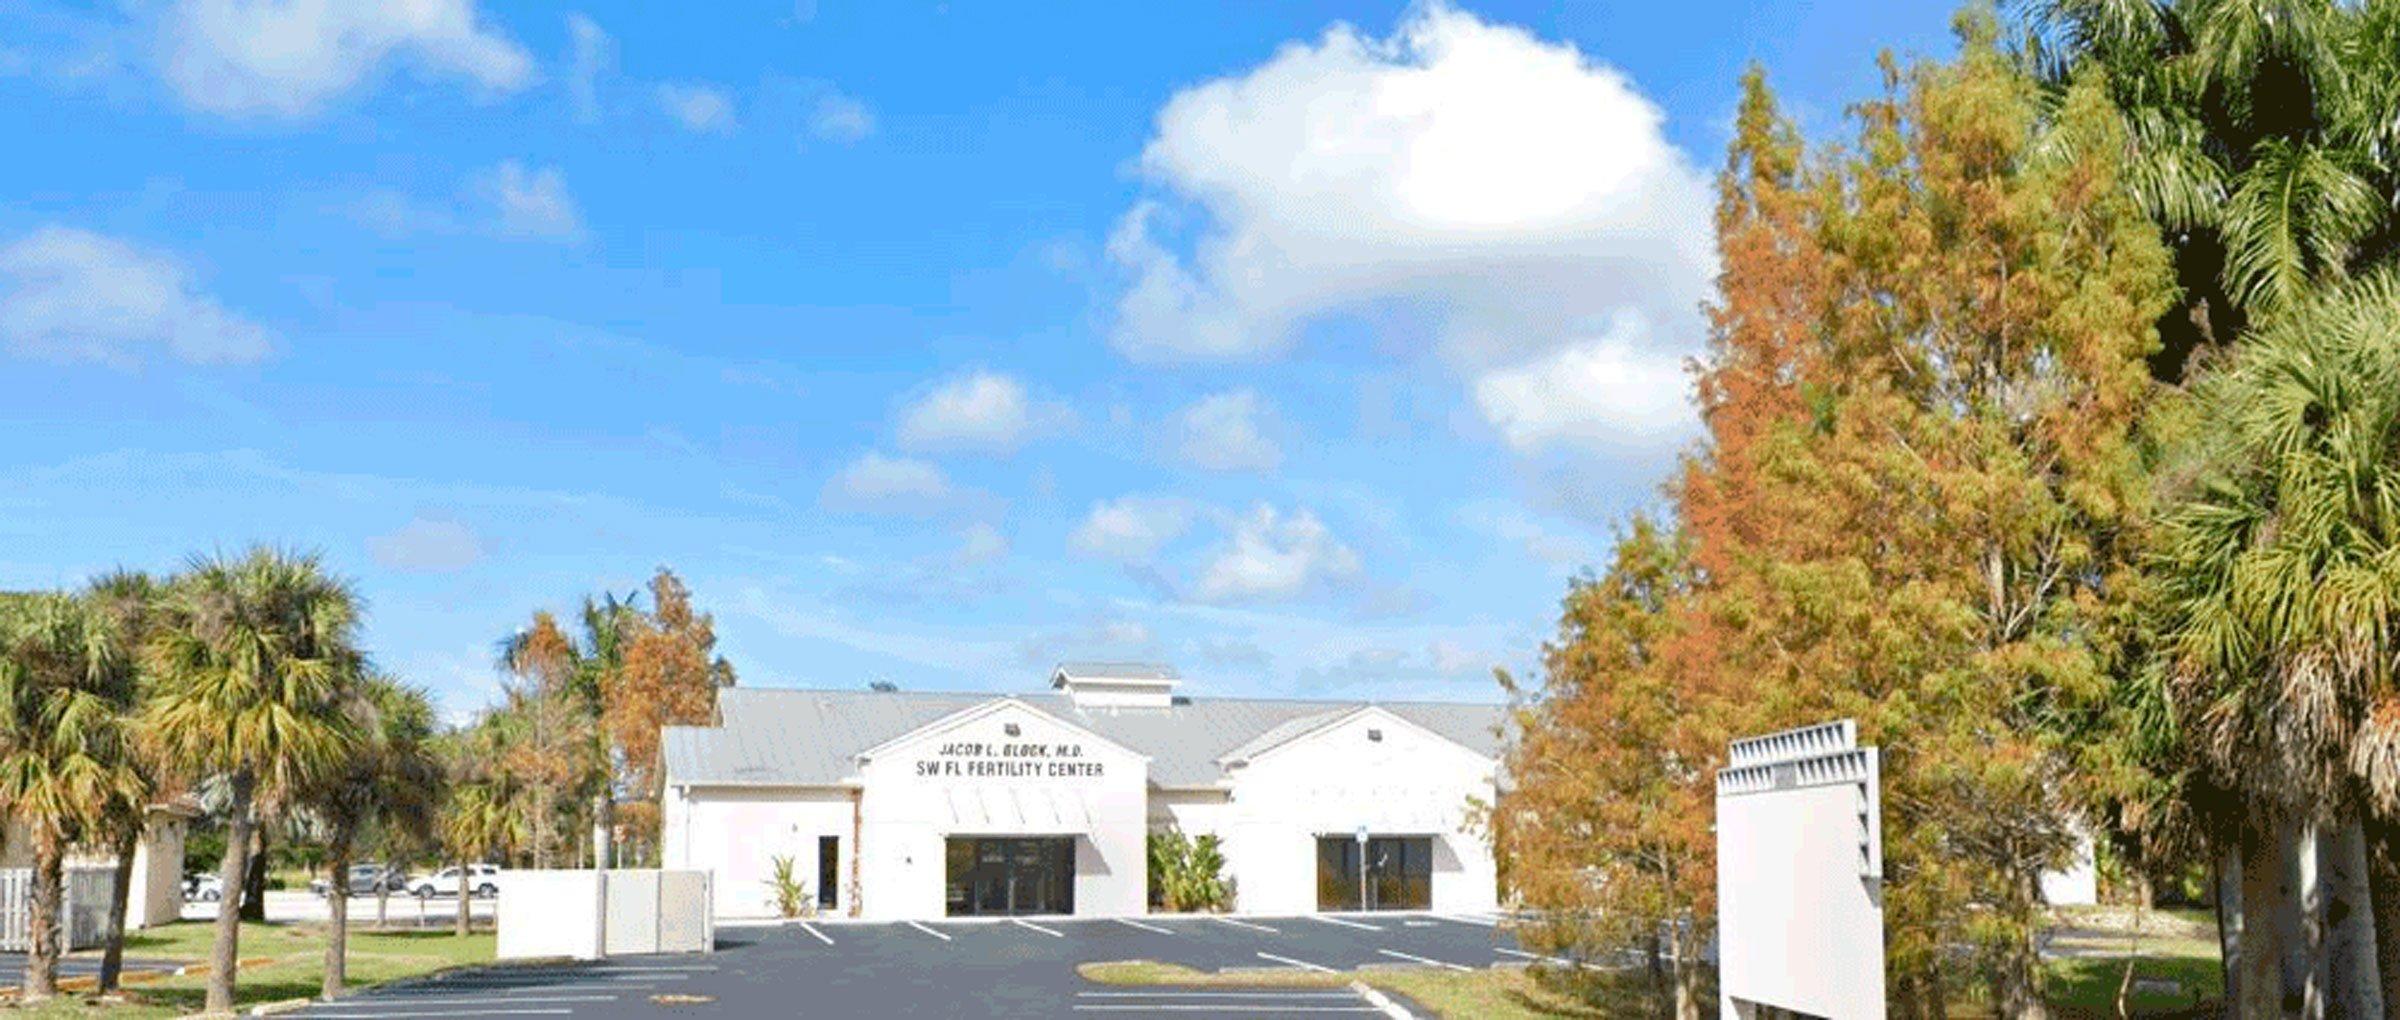 southwest-florida-fertility-center